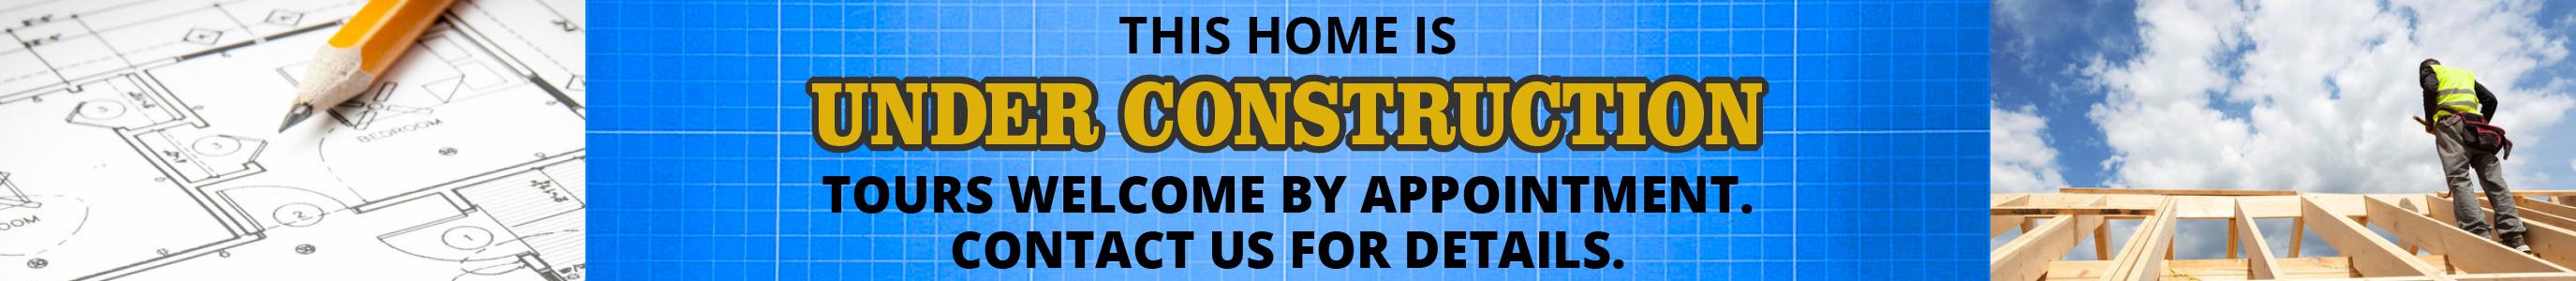 Kurk Homes Under Construction banner 2750x300 4-30-19